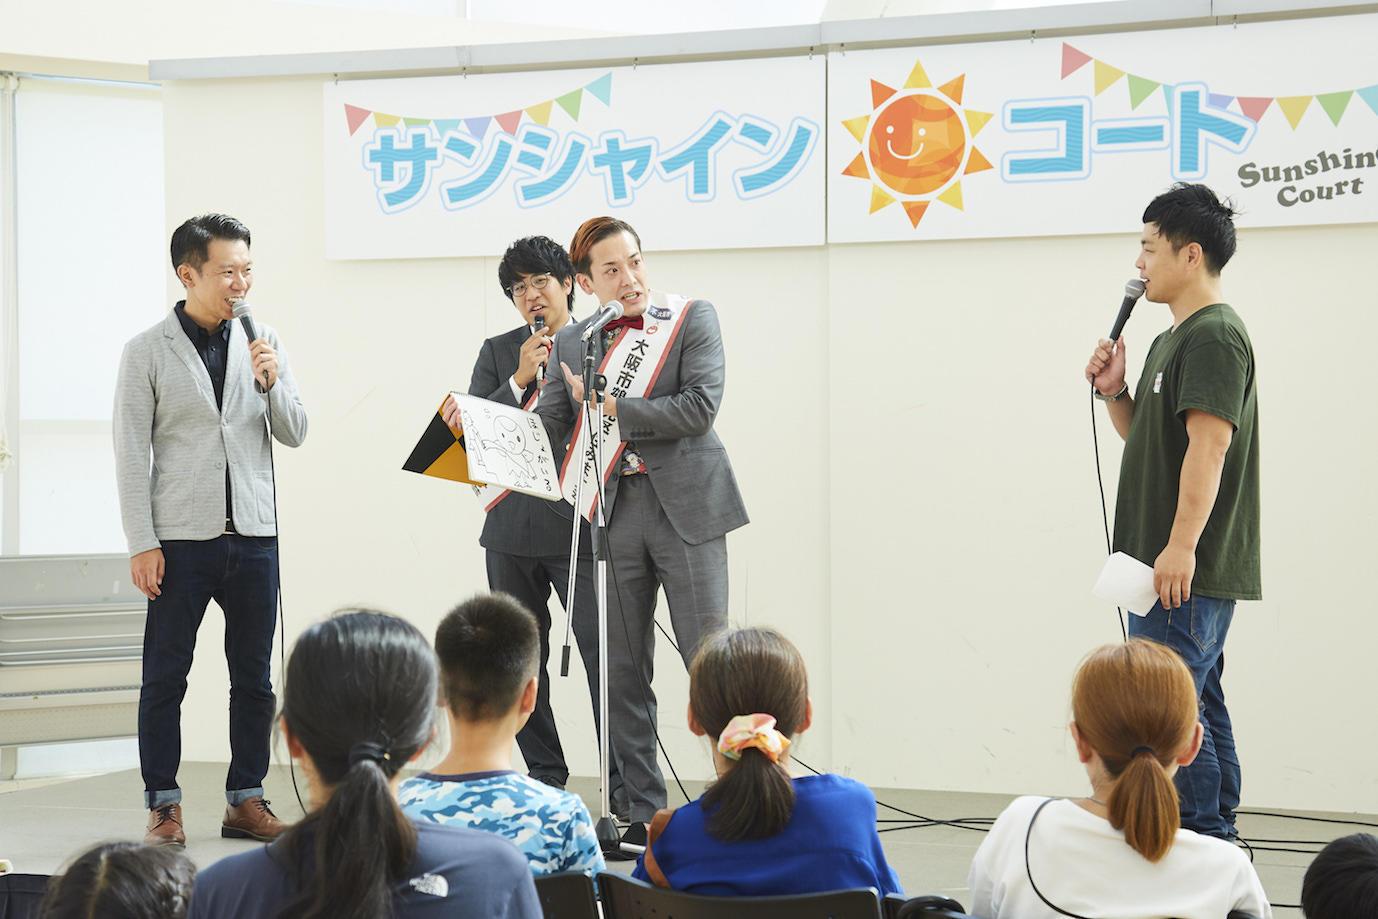 http://news.yoshimoto.co.jp/20180806162409-222af590df2f6cb301e8534bc23c7f3597a9e8c7.jpg